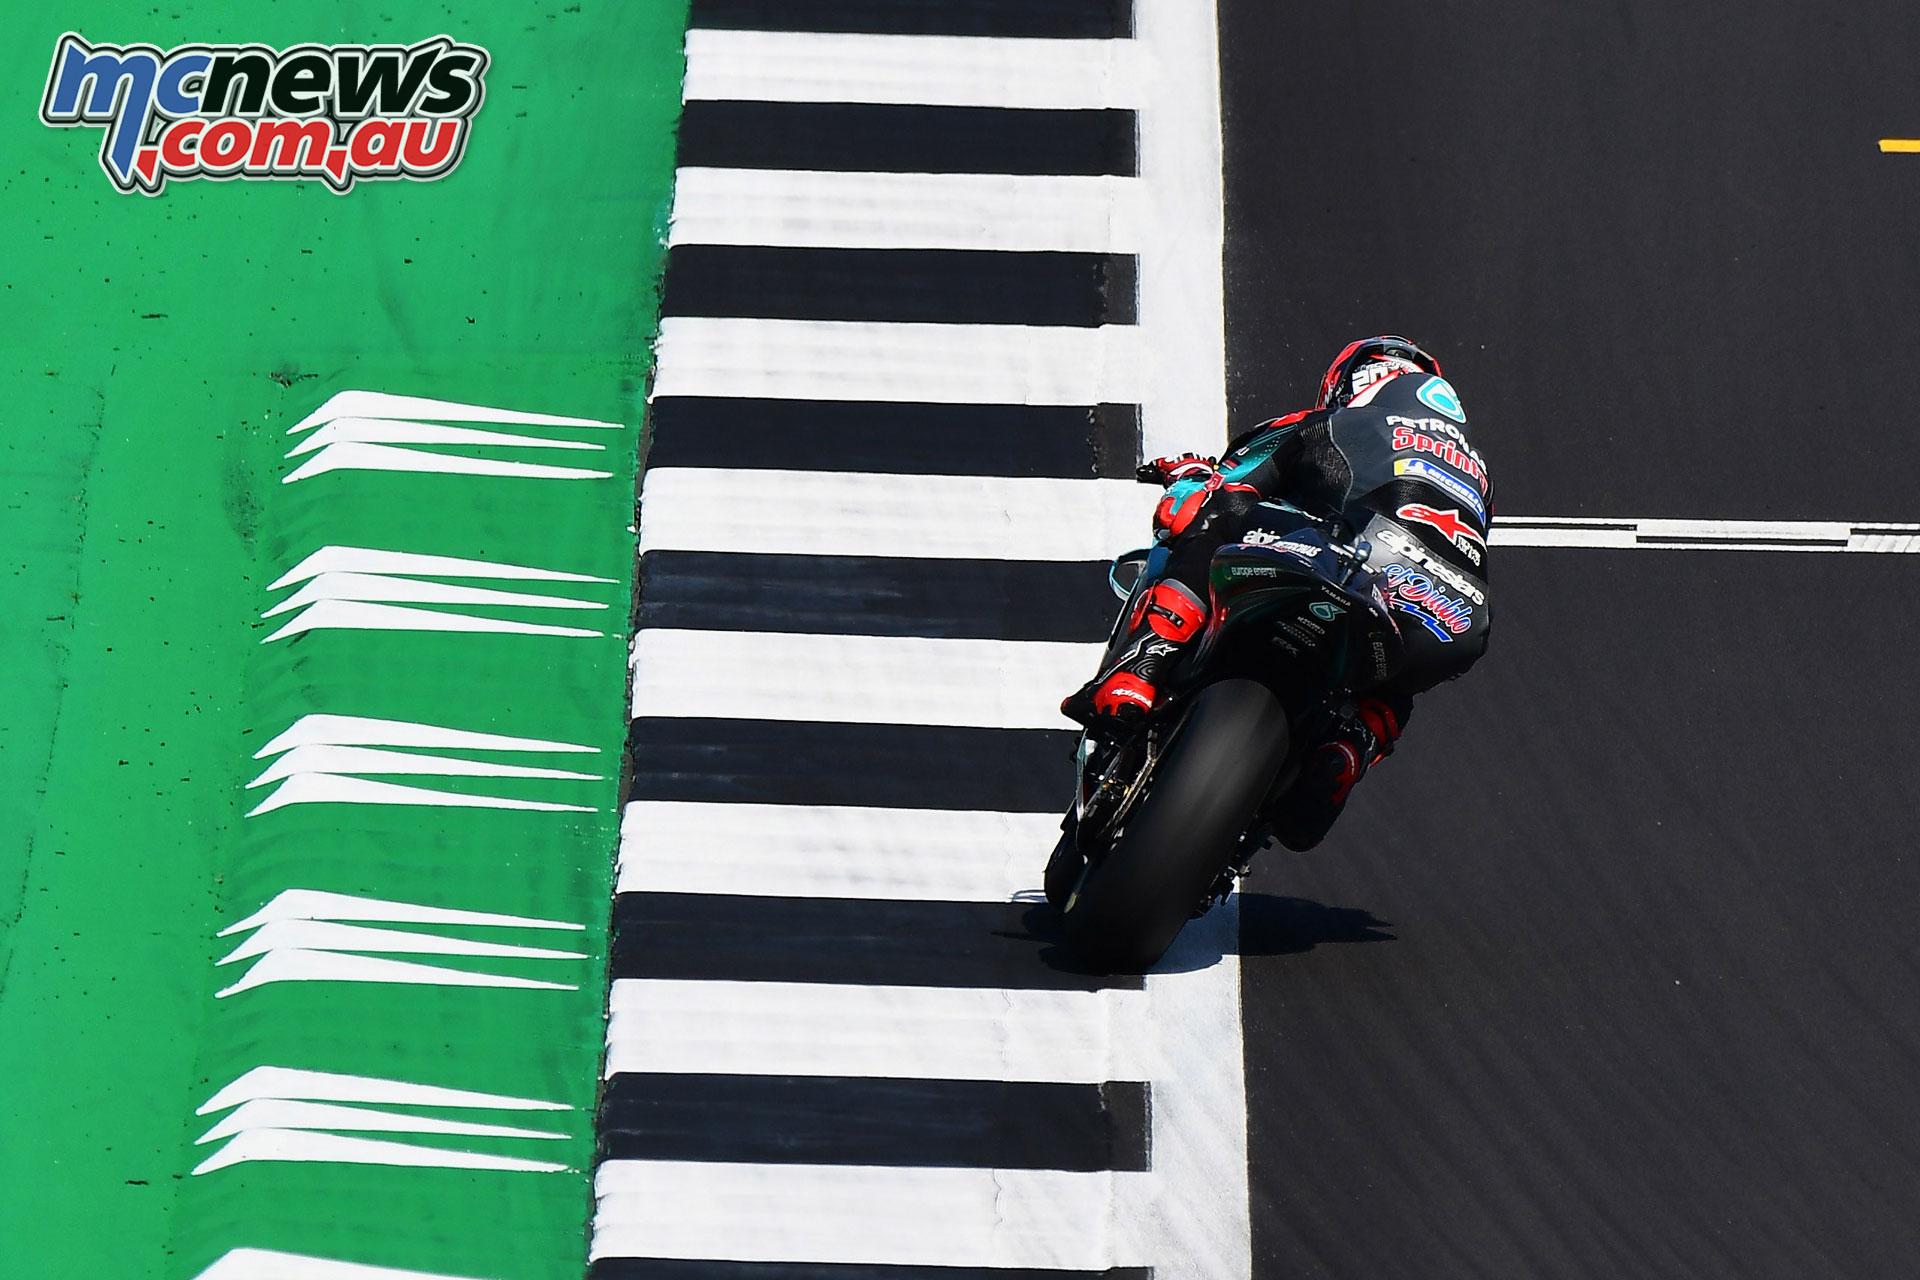 MotoGP Rnd Silverstone Quartararo